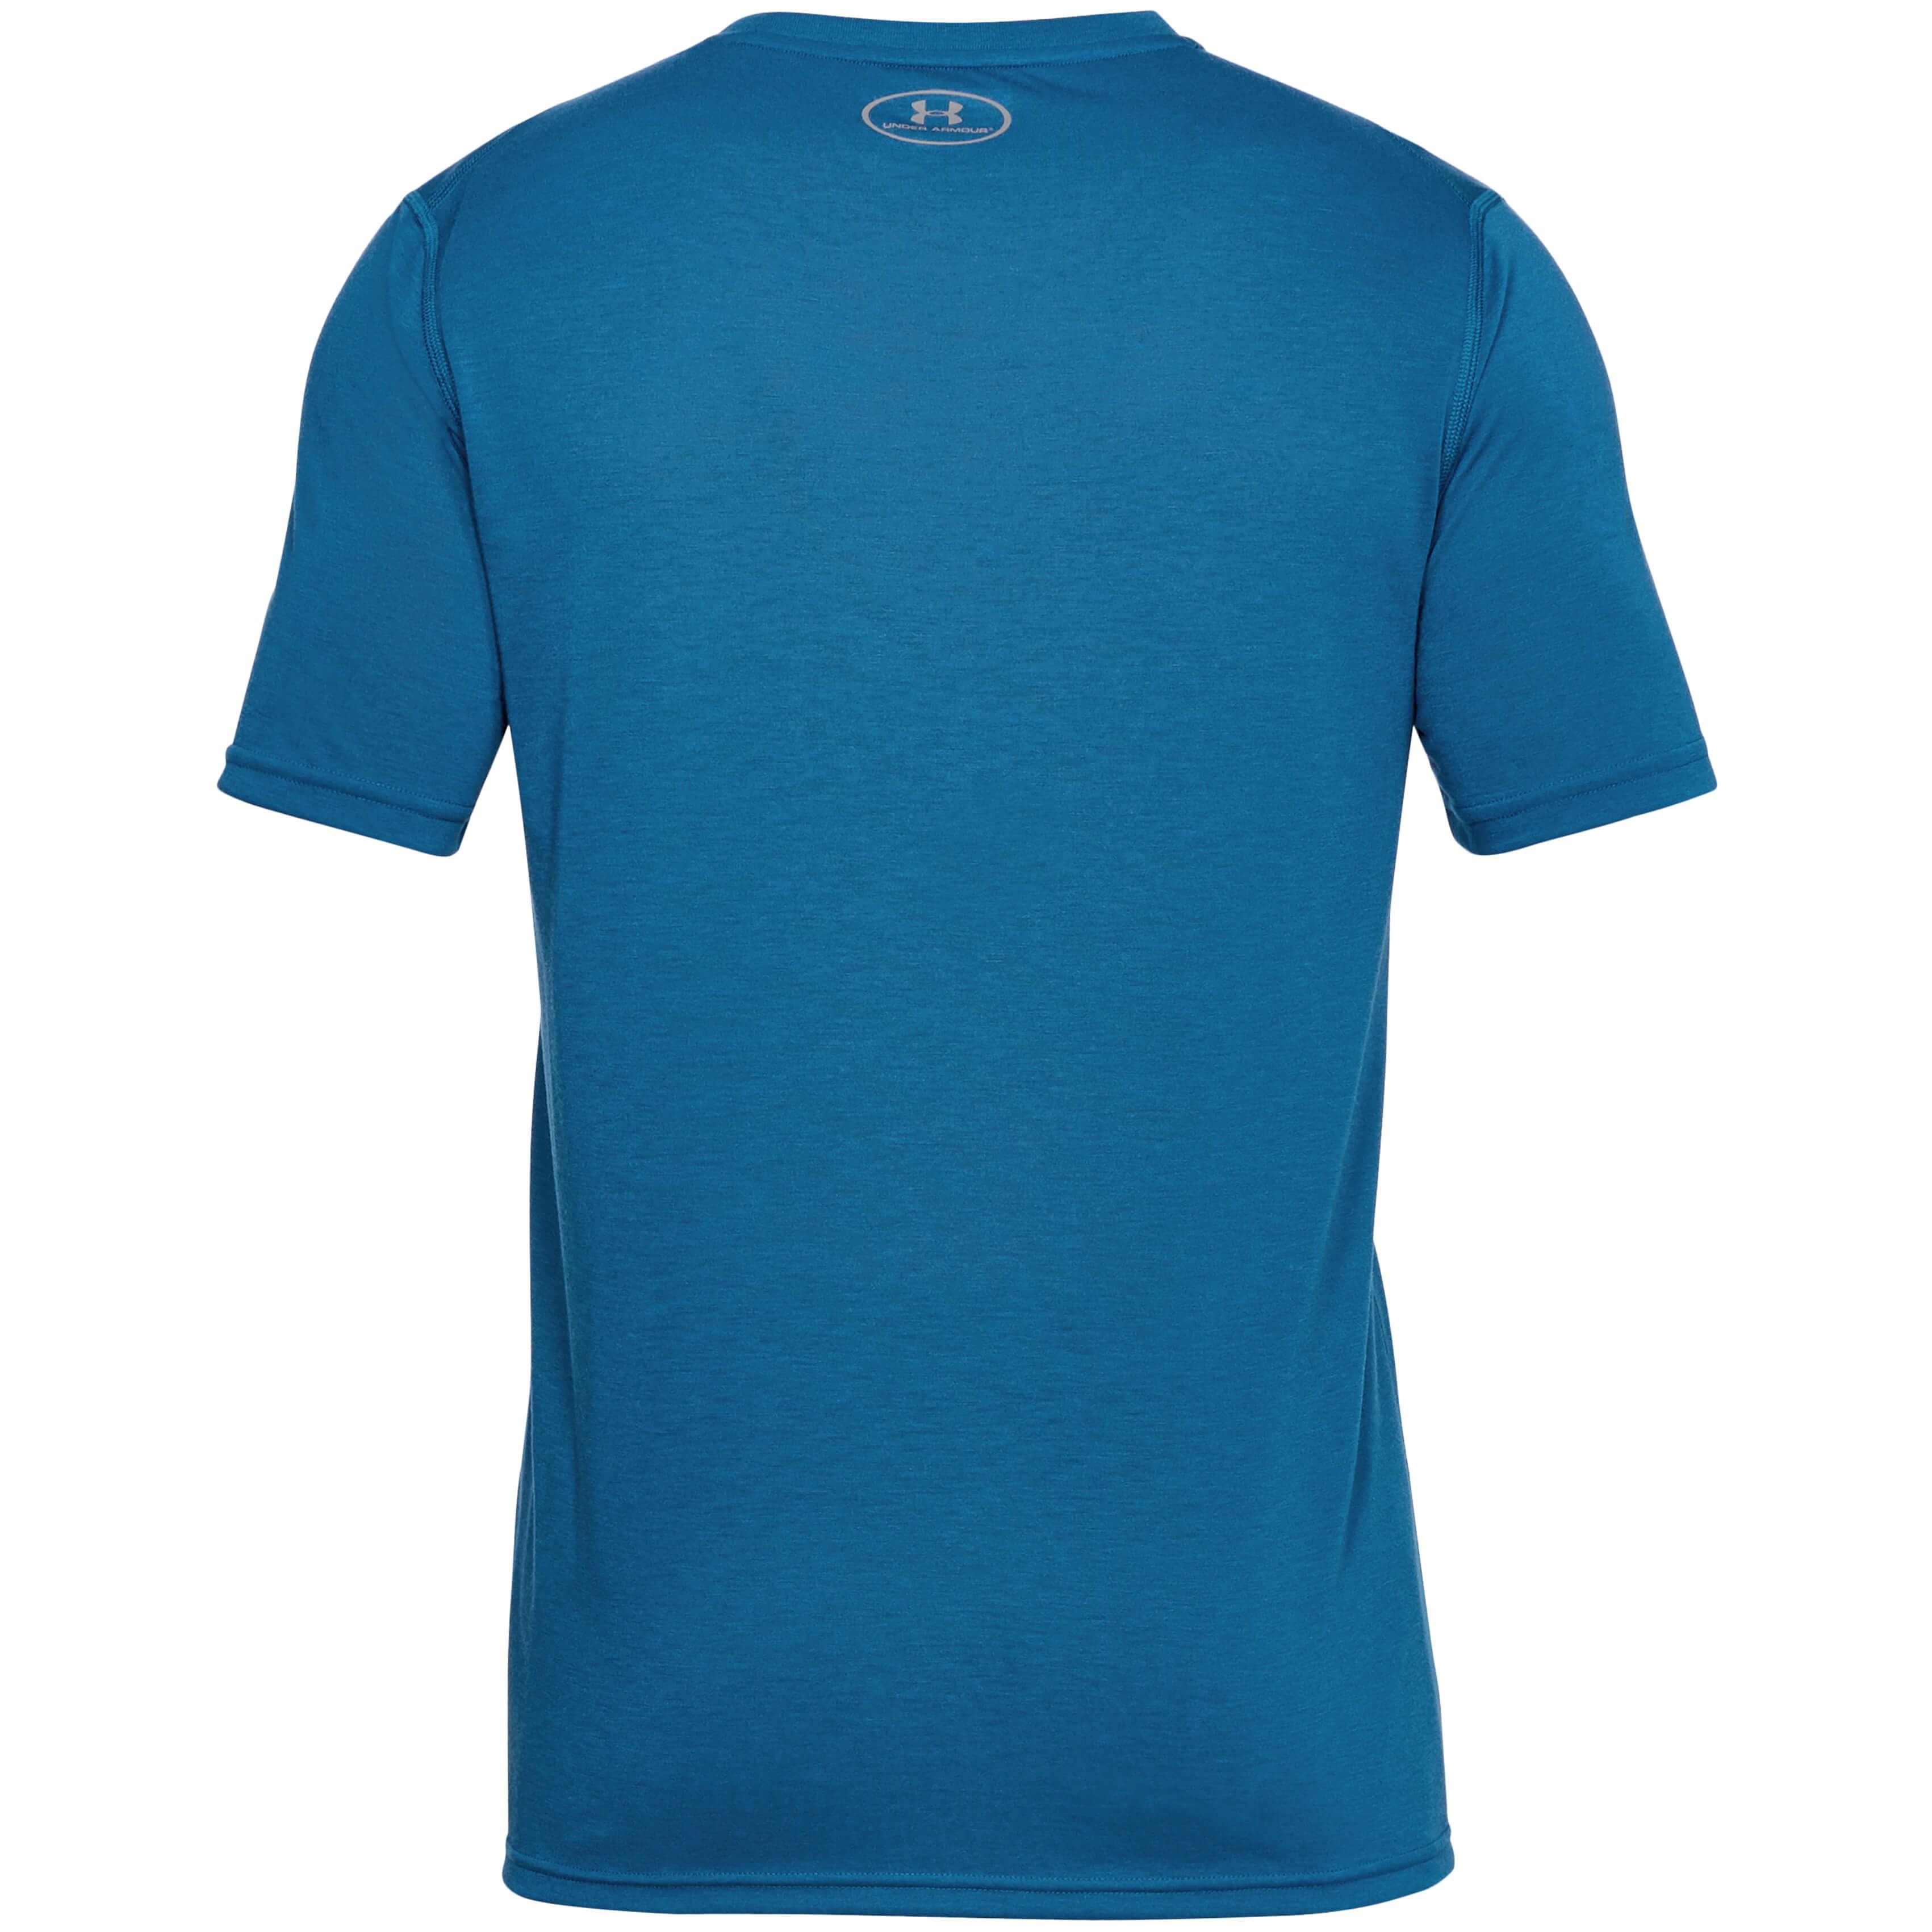 Under-Armour-Mens-UA-Threadborne-Fitted-Short-Sleeve-Gym-Tee-Sport-T-Shirt thumbnail 26